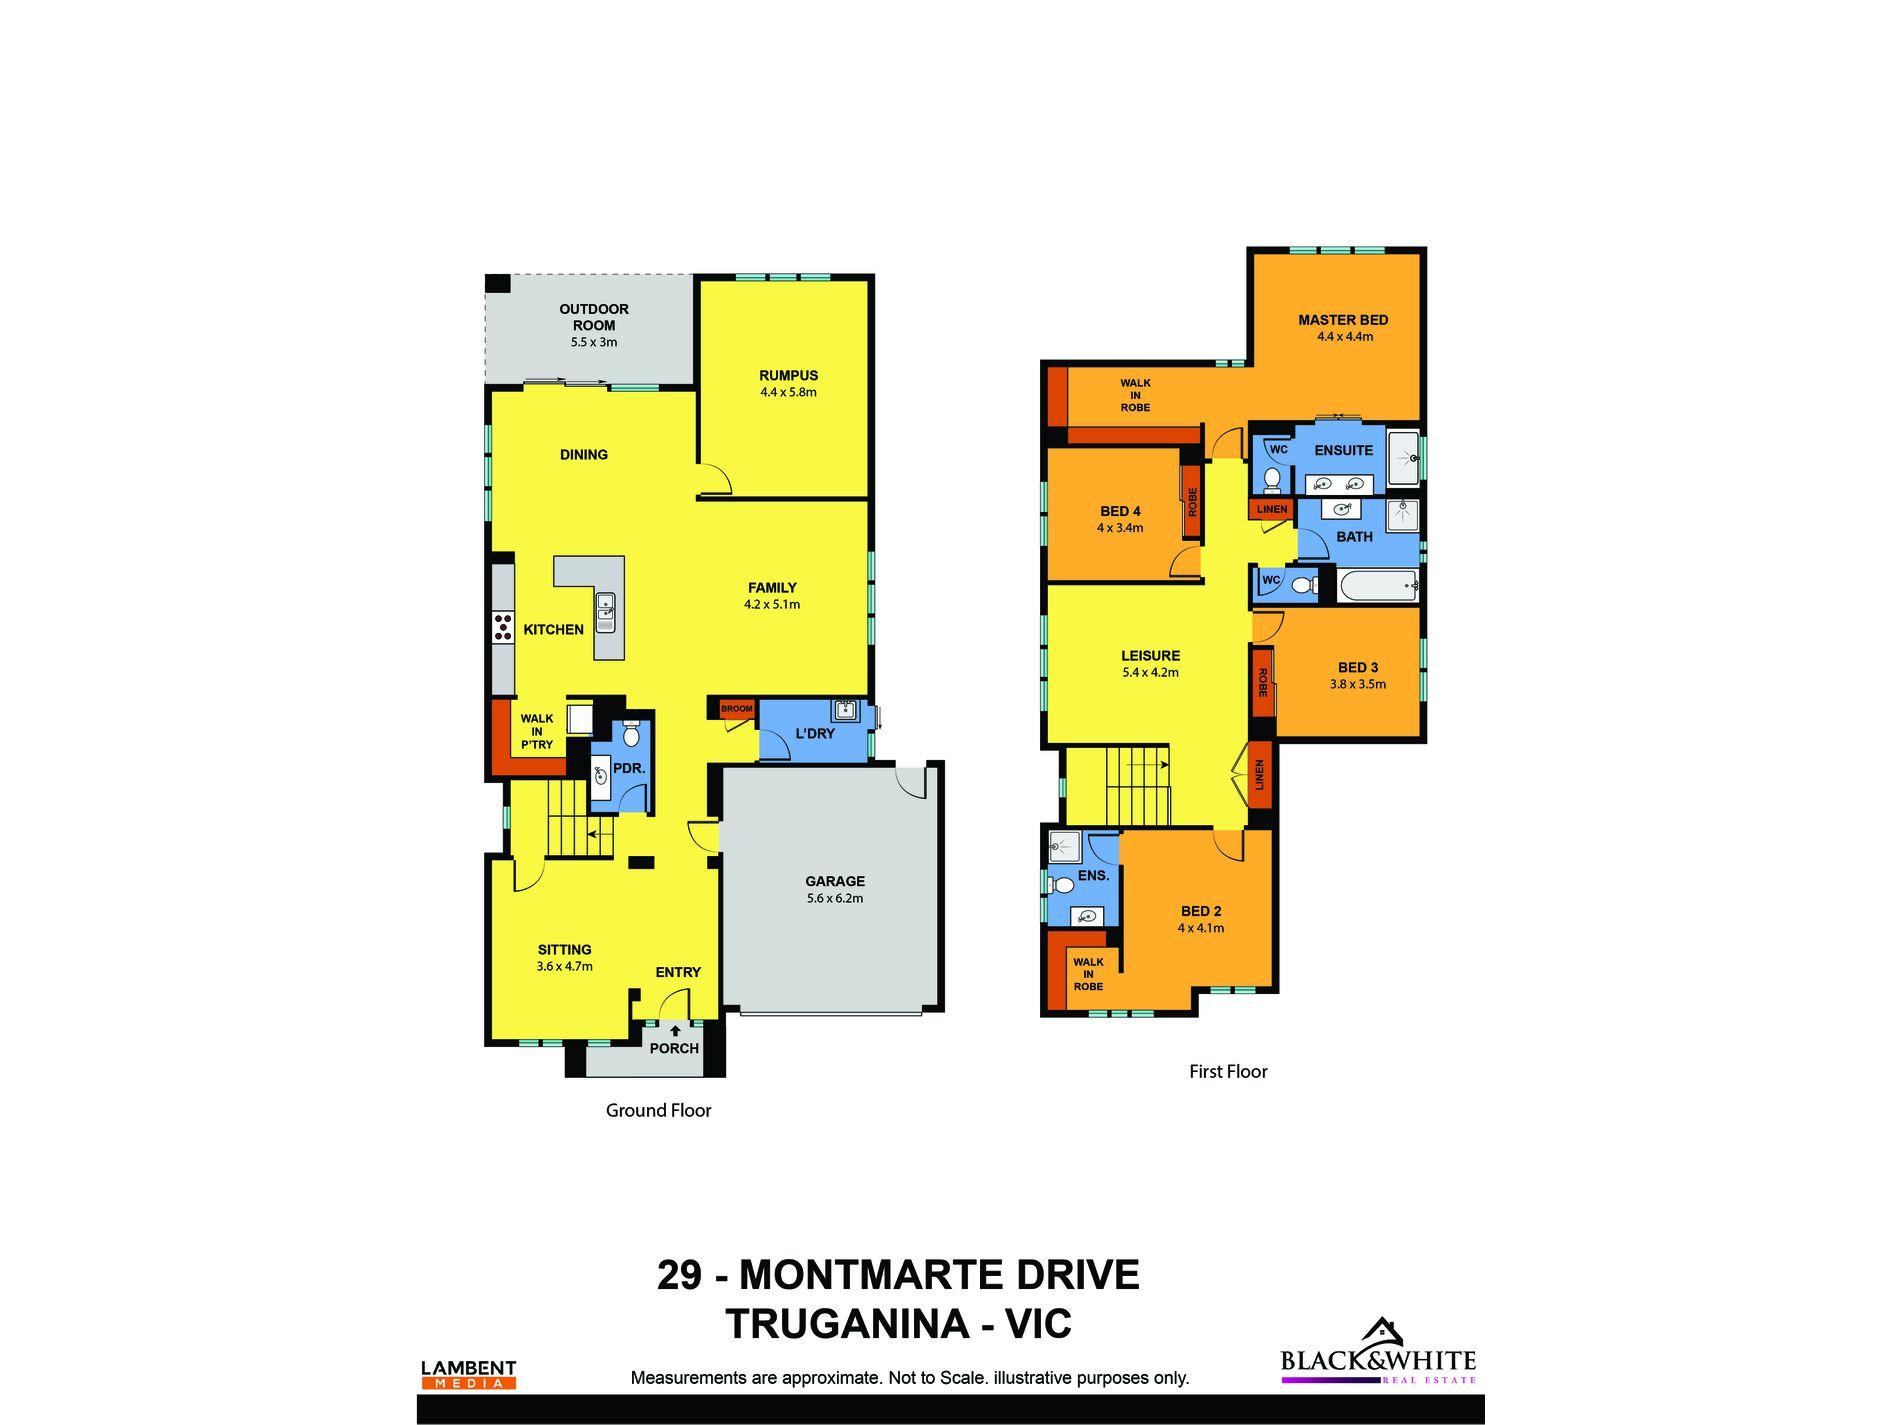 29 Montmarte Drive, Truganina